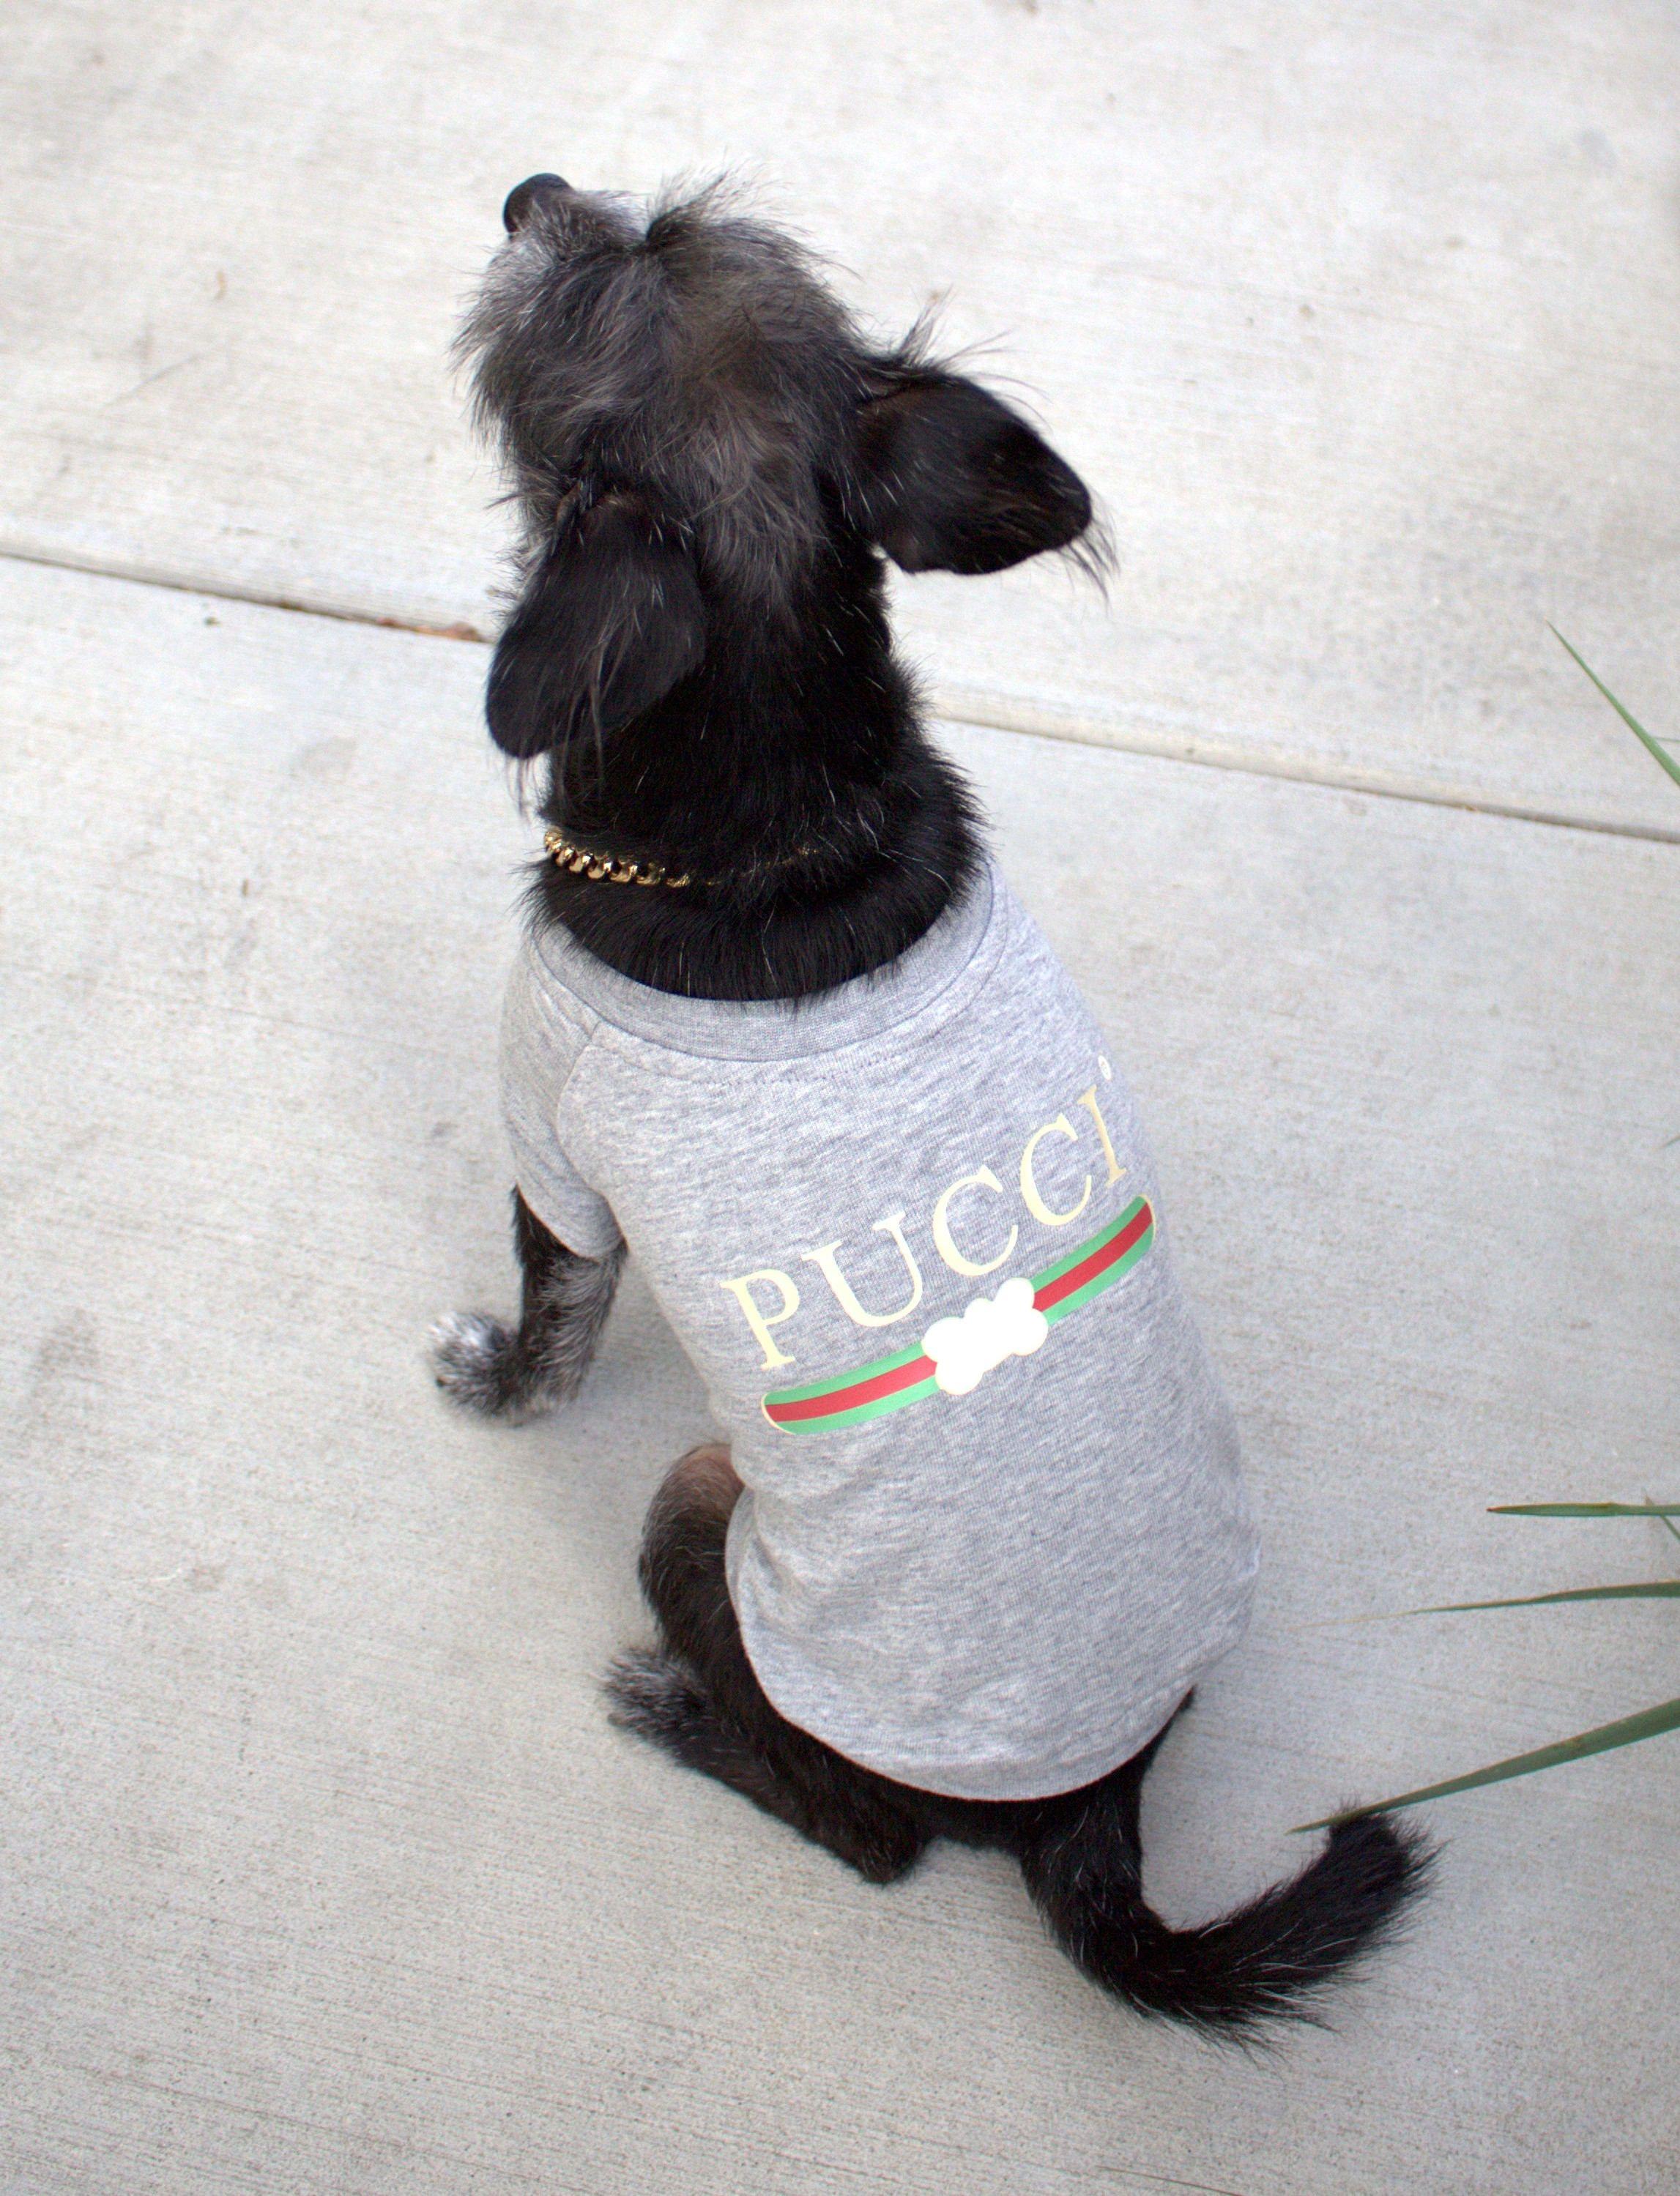 2e4e7344b74 Designer Dog Shirt PUCCI Dog Tee Dog Tshirt Pet Clothing